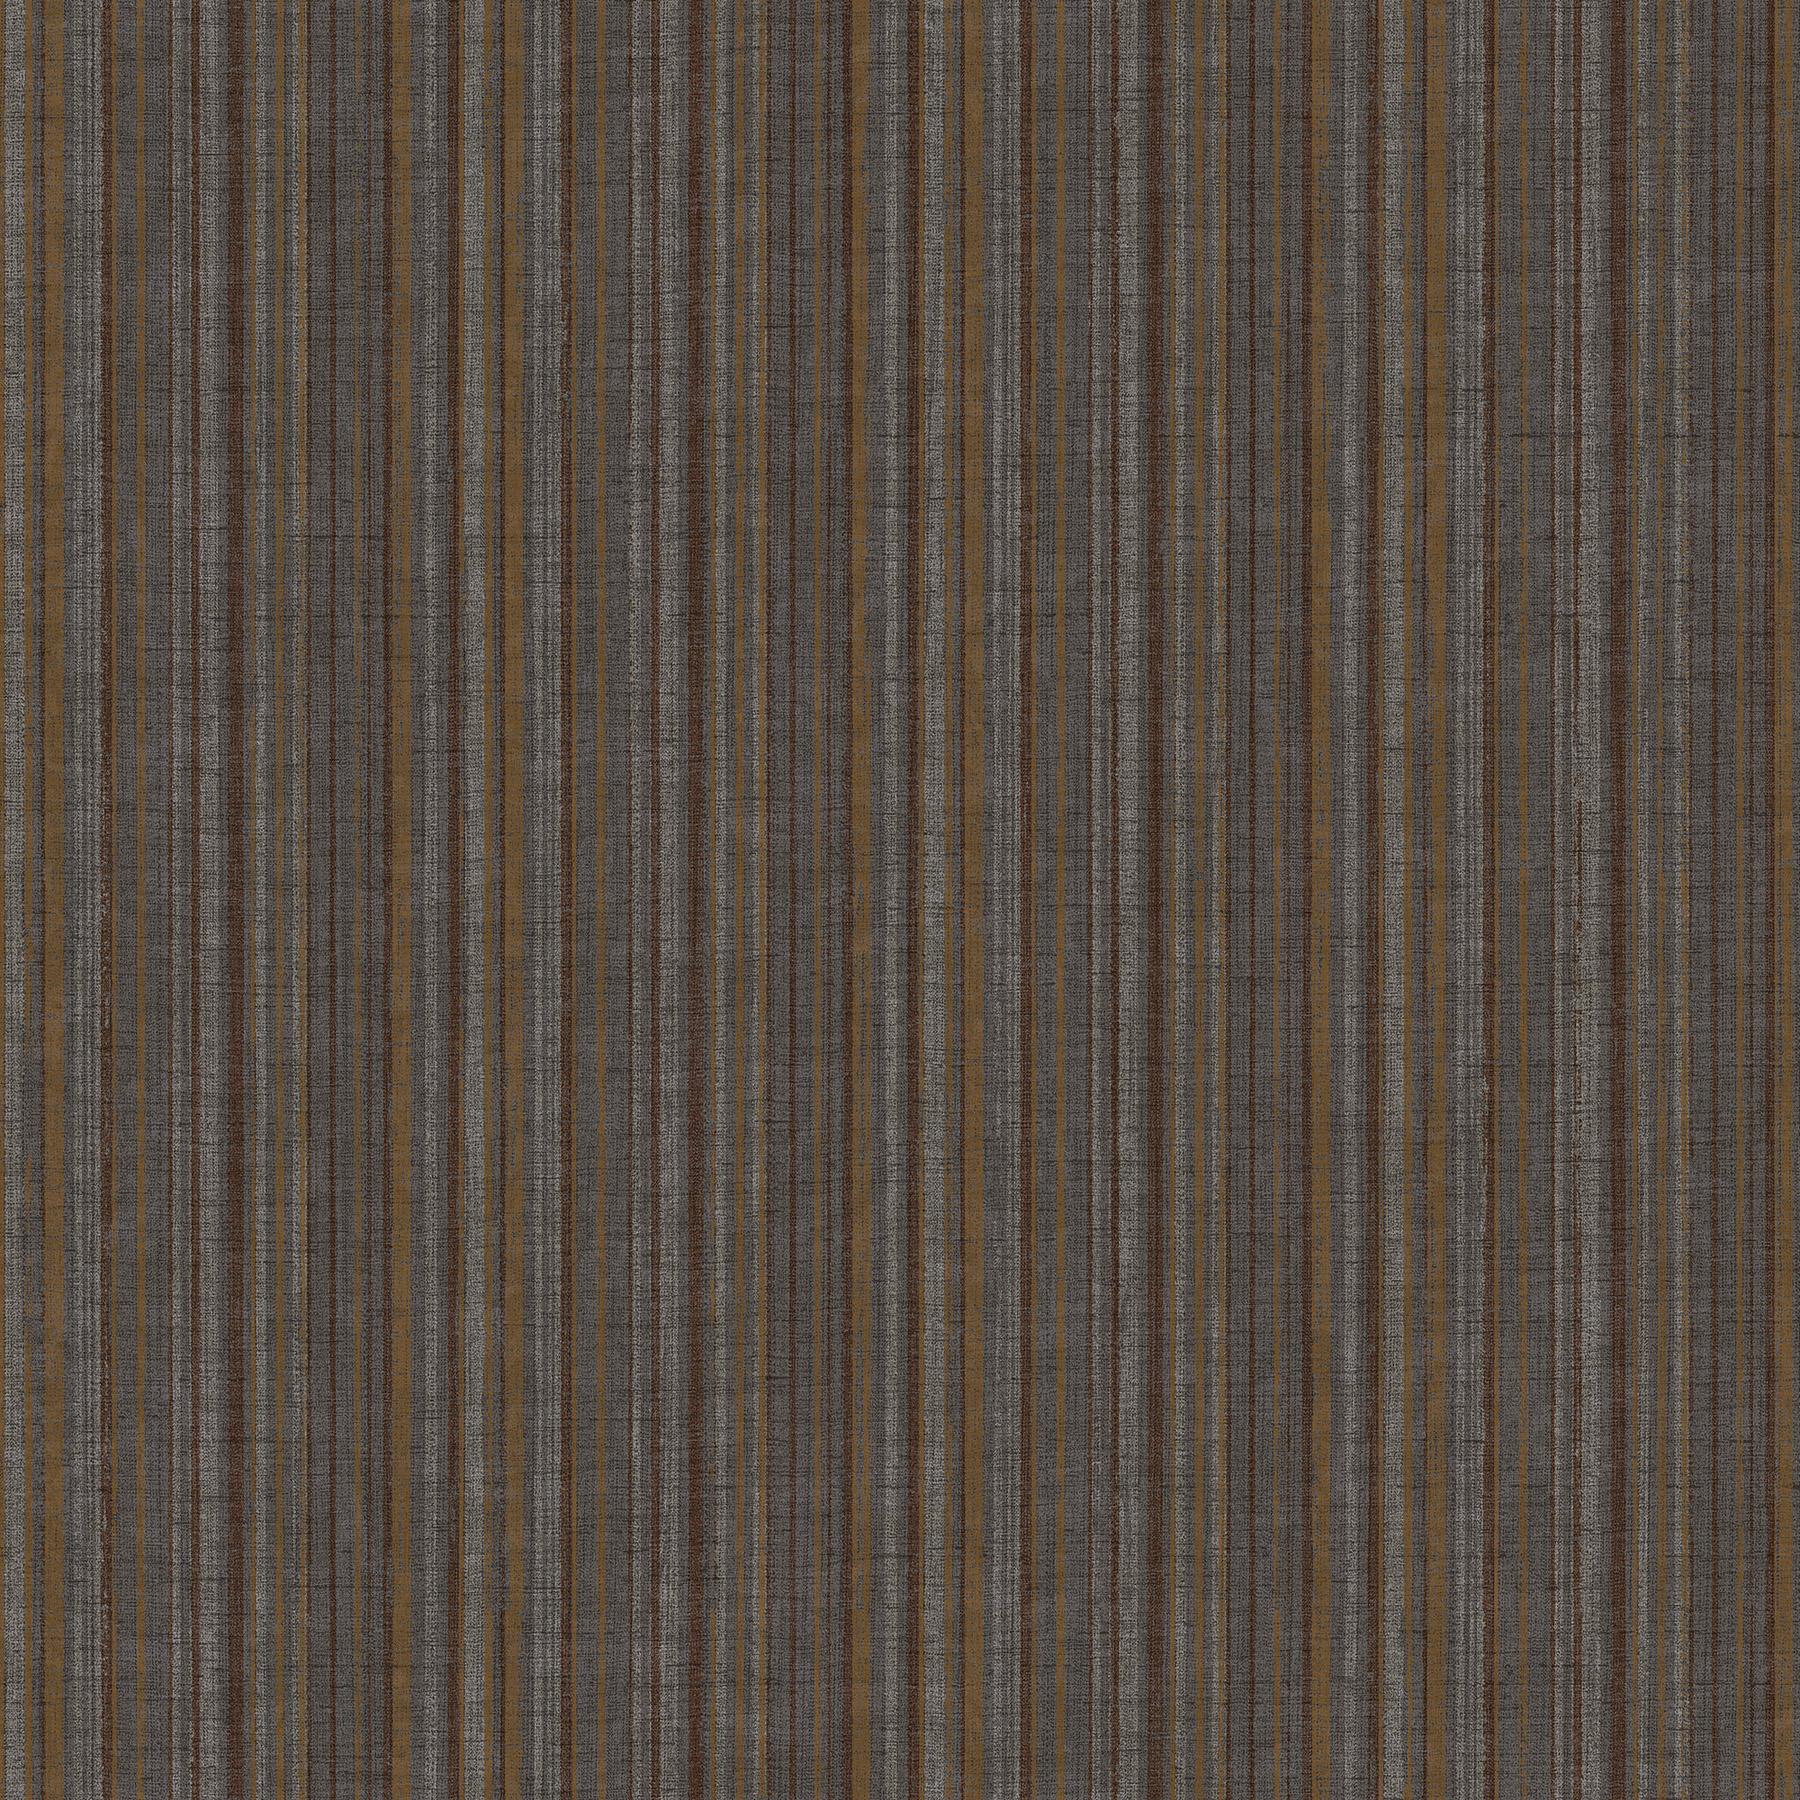 Picture of Brown Mutli Stripe Wallpaper